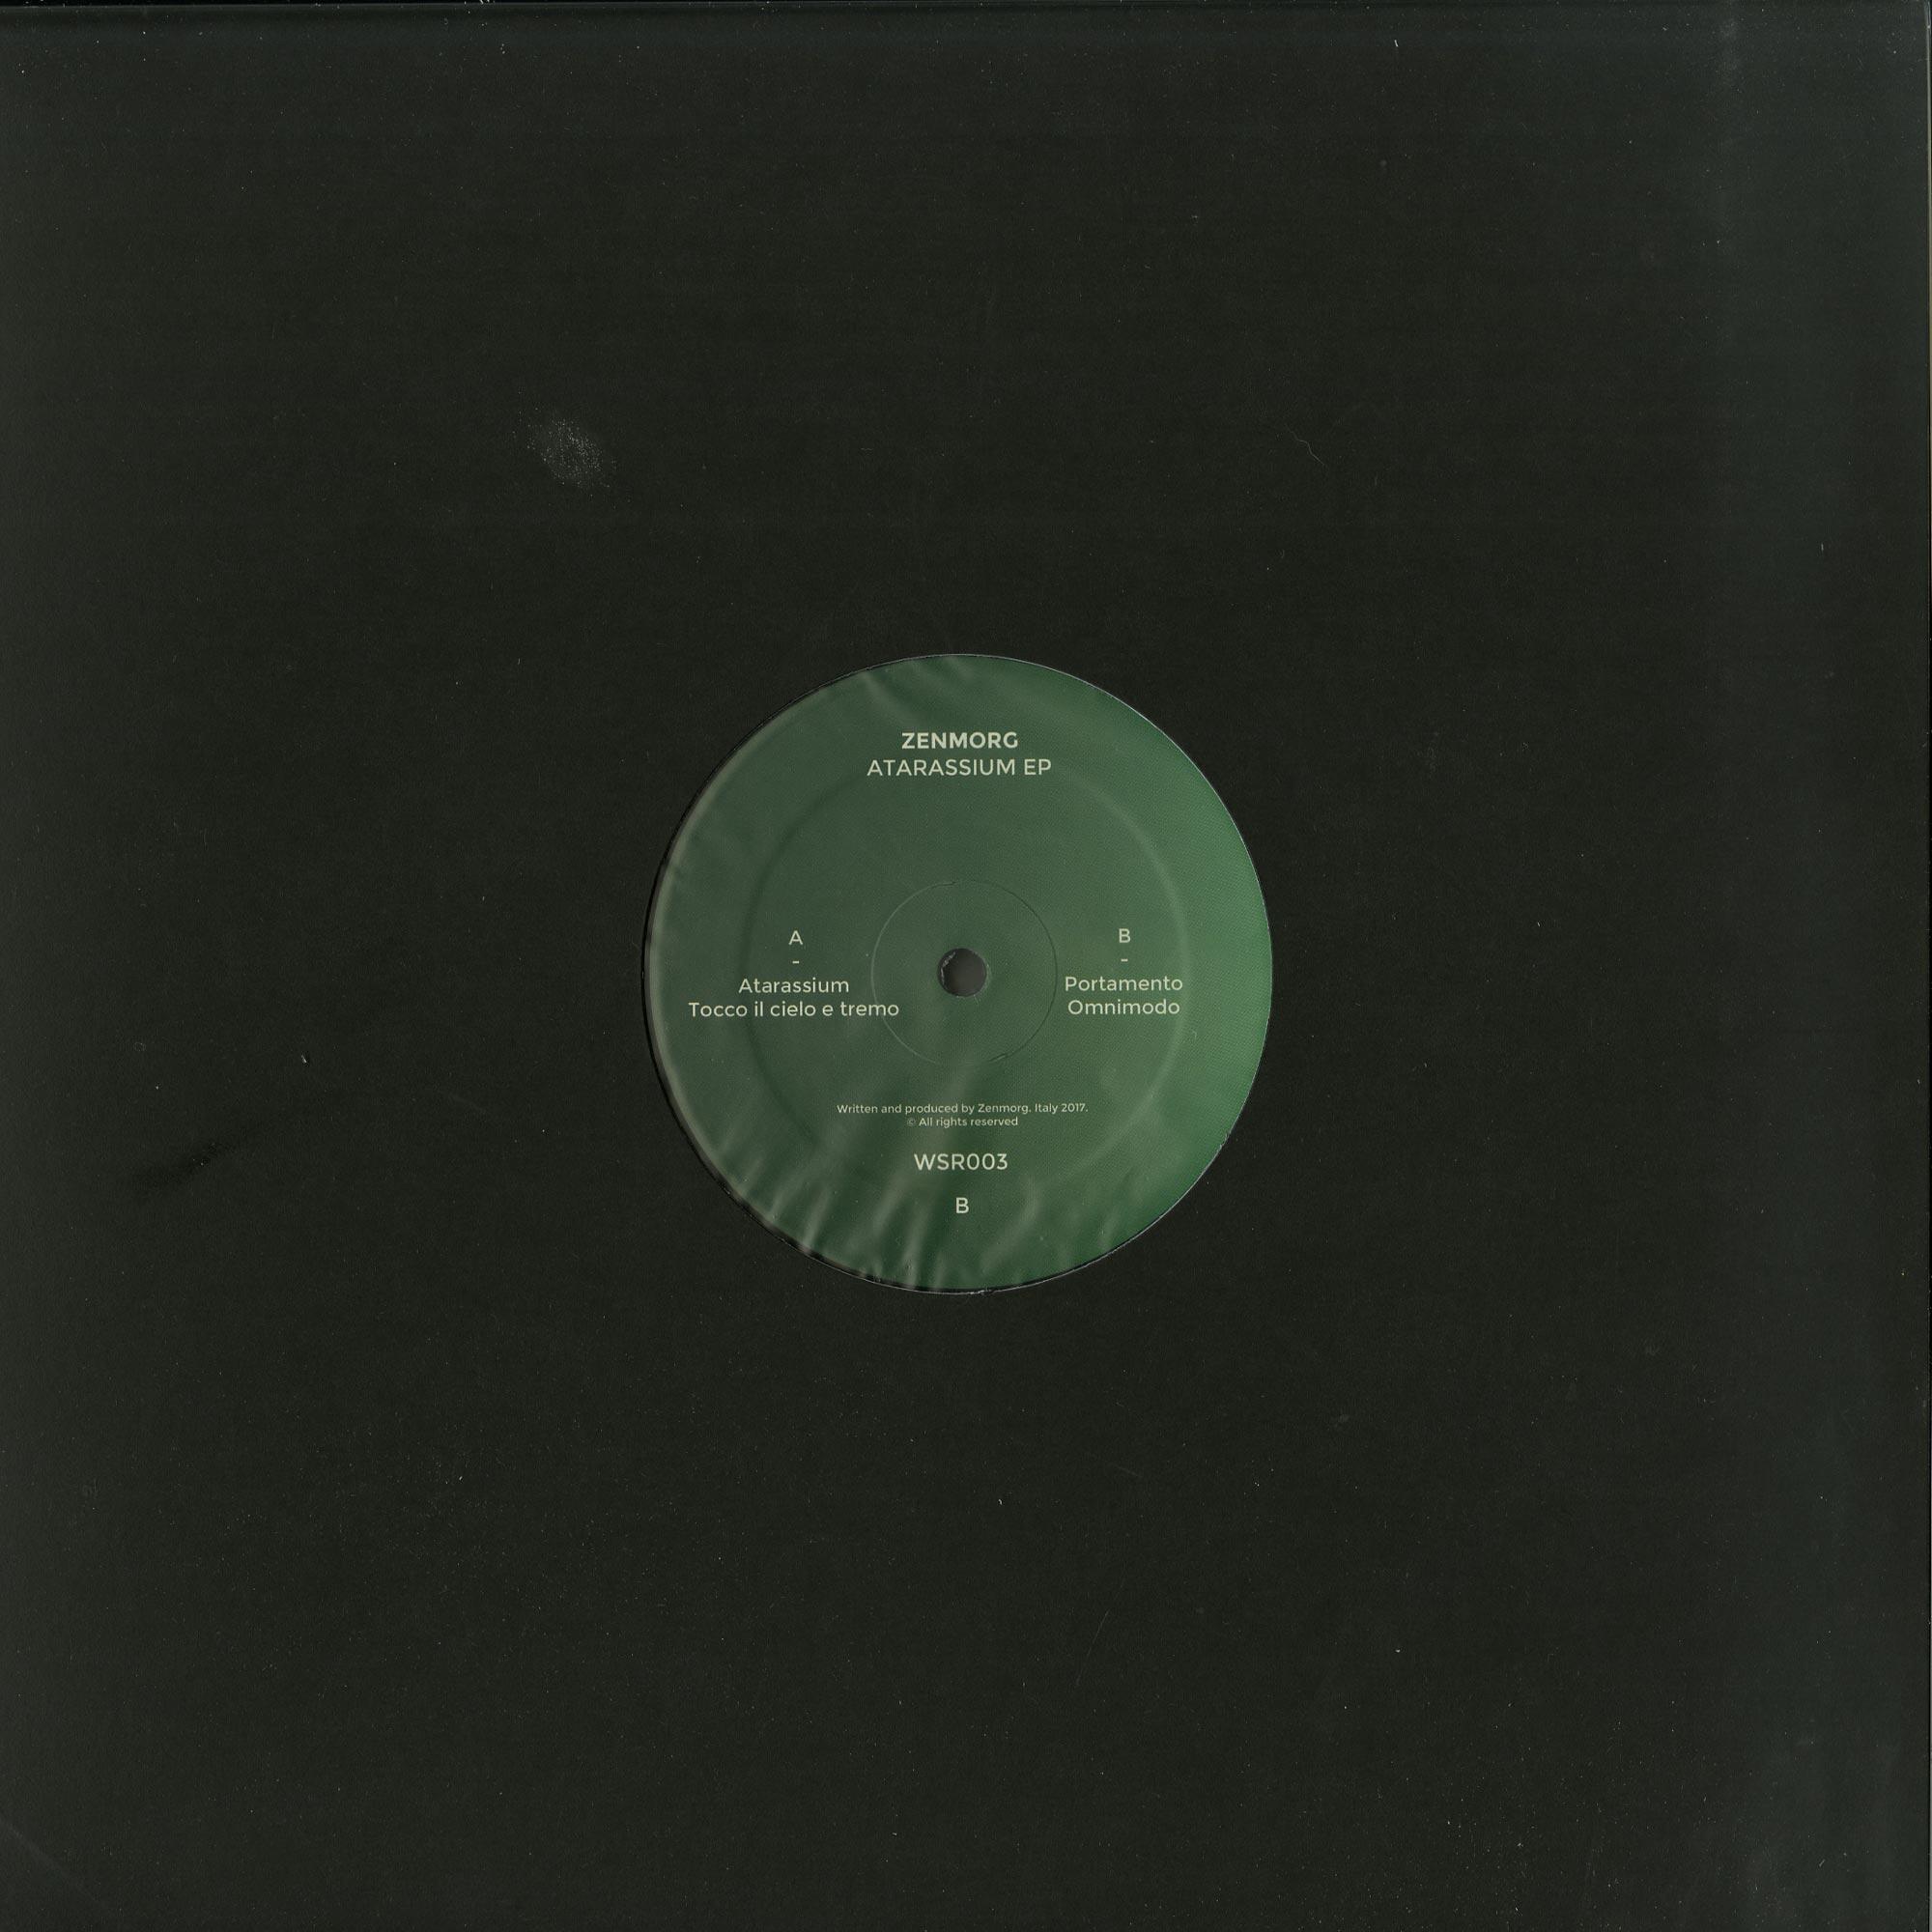 Zenmorg - ATARASSIUM EP